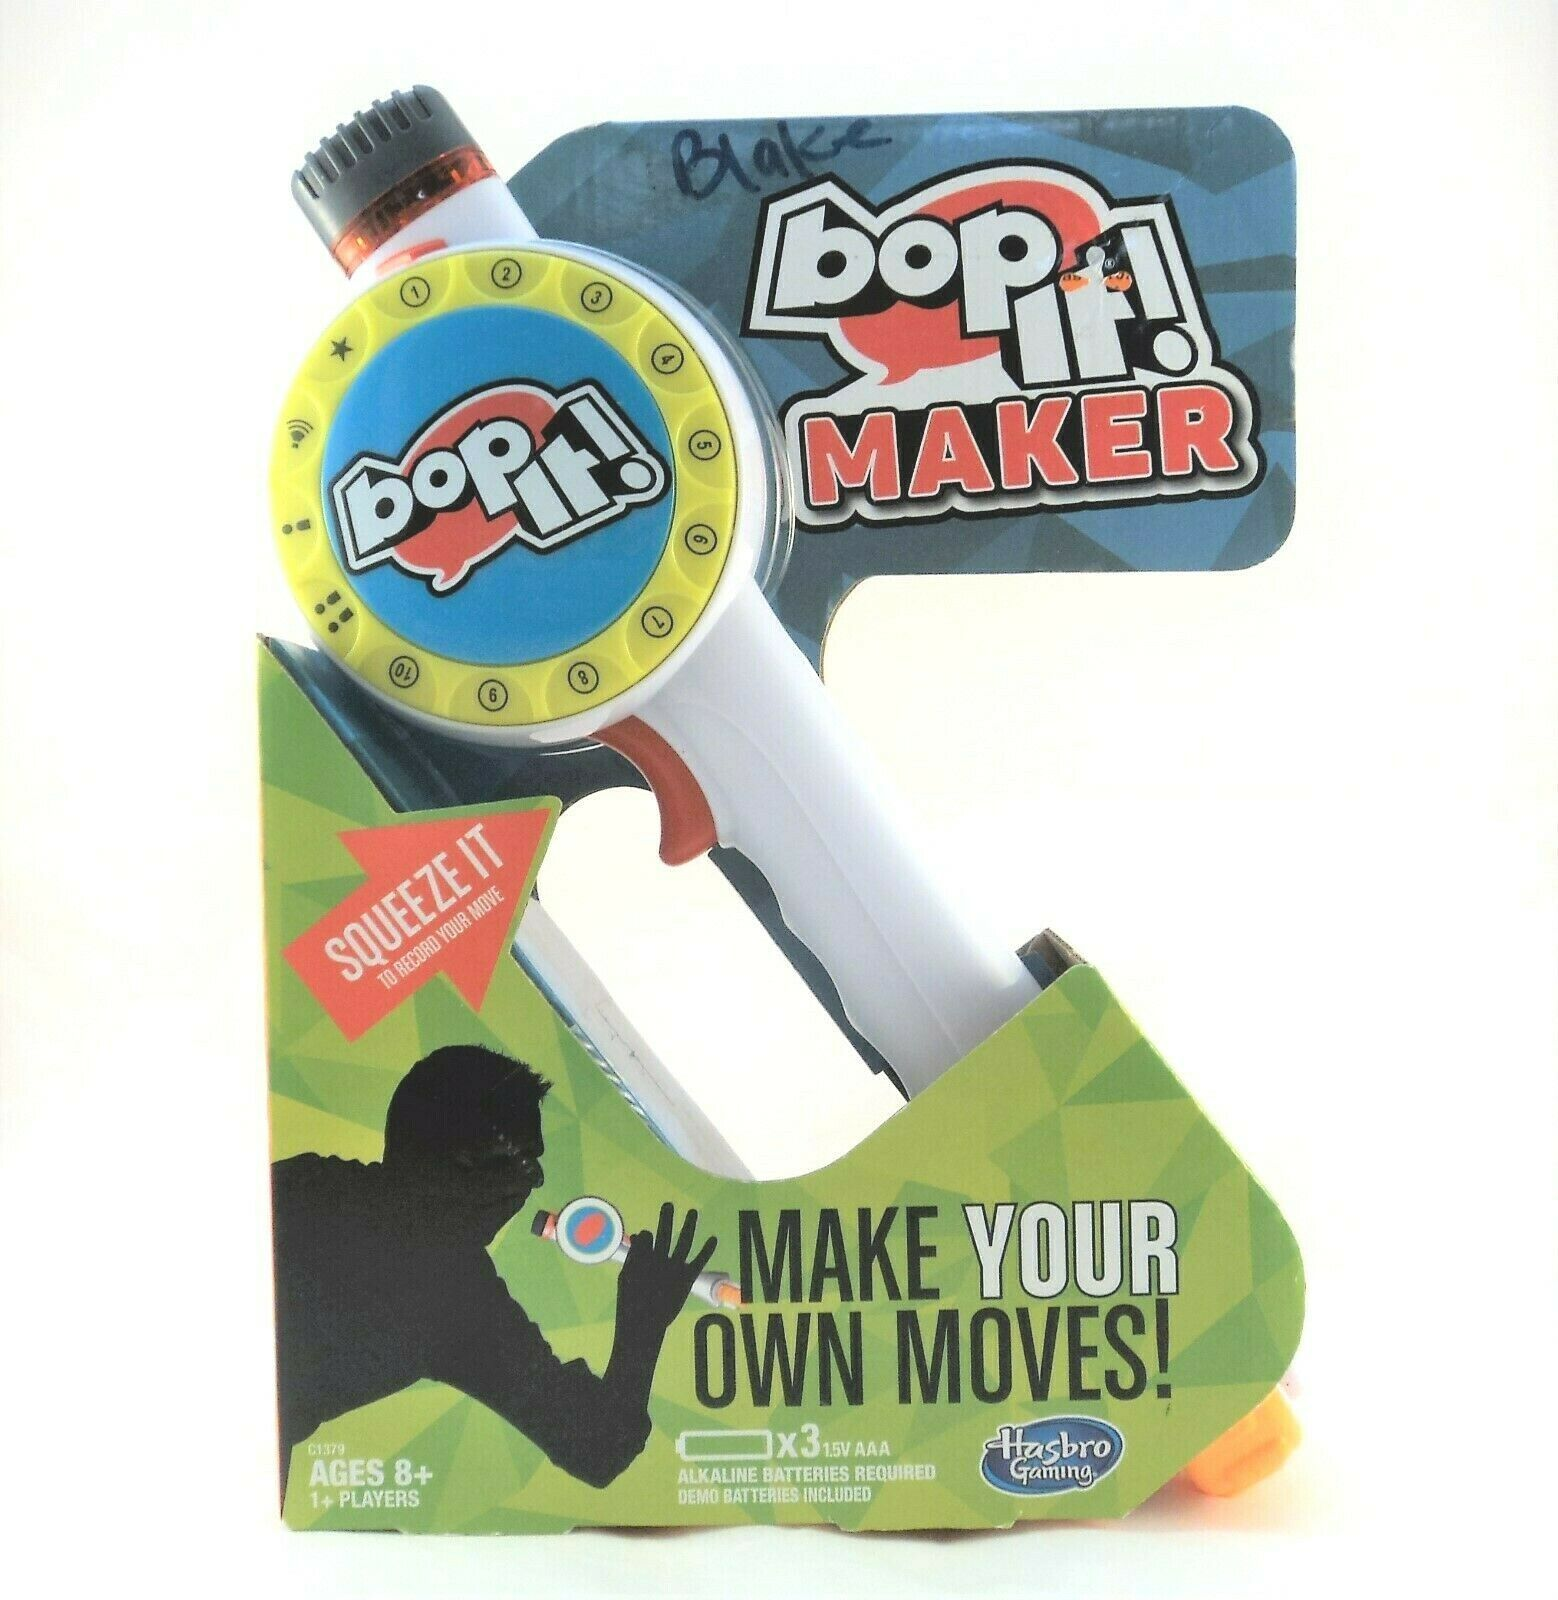 Hasbro Bop It! Maker Game